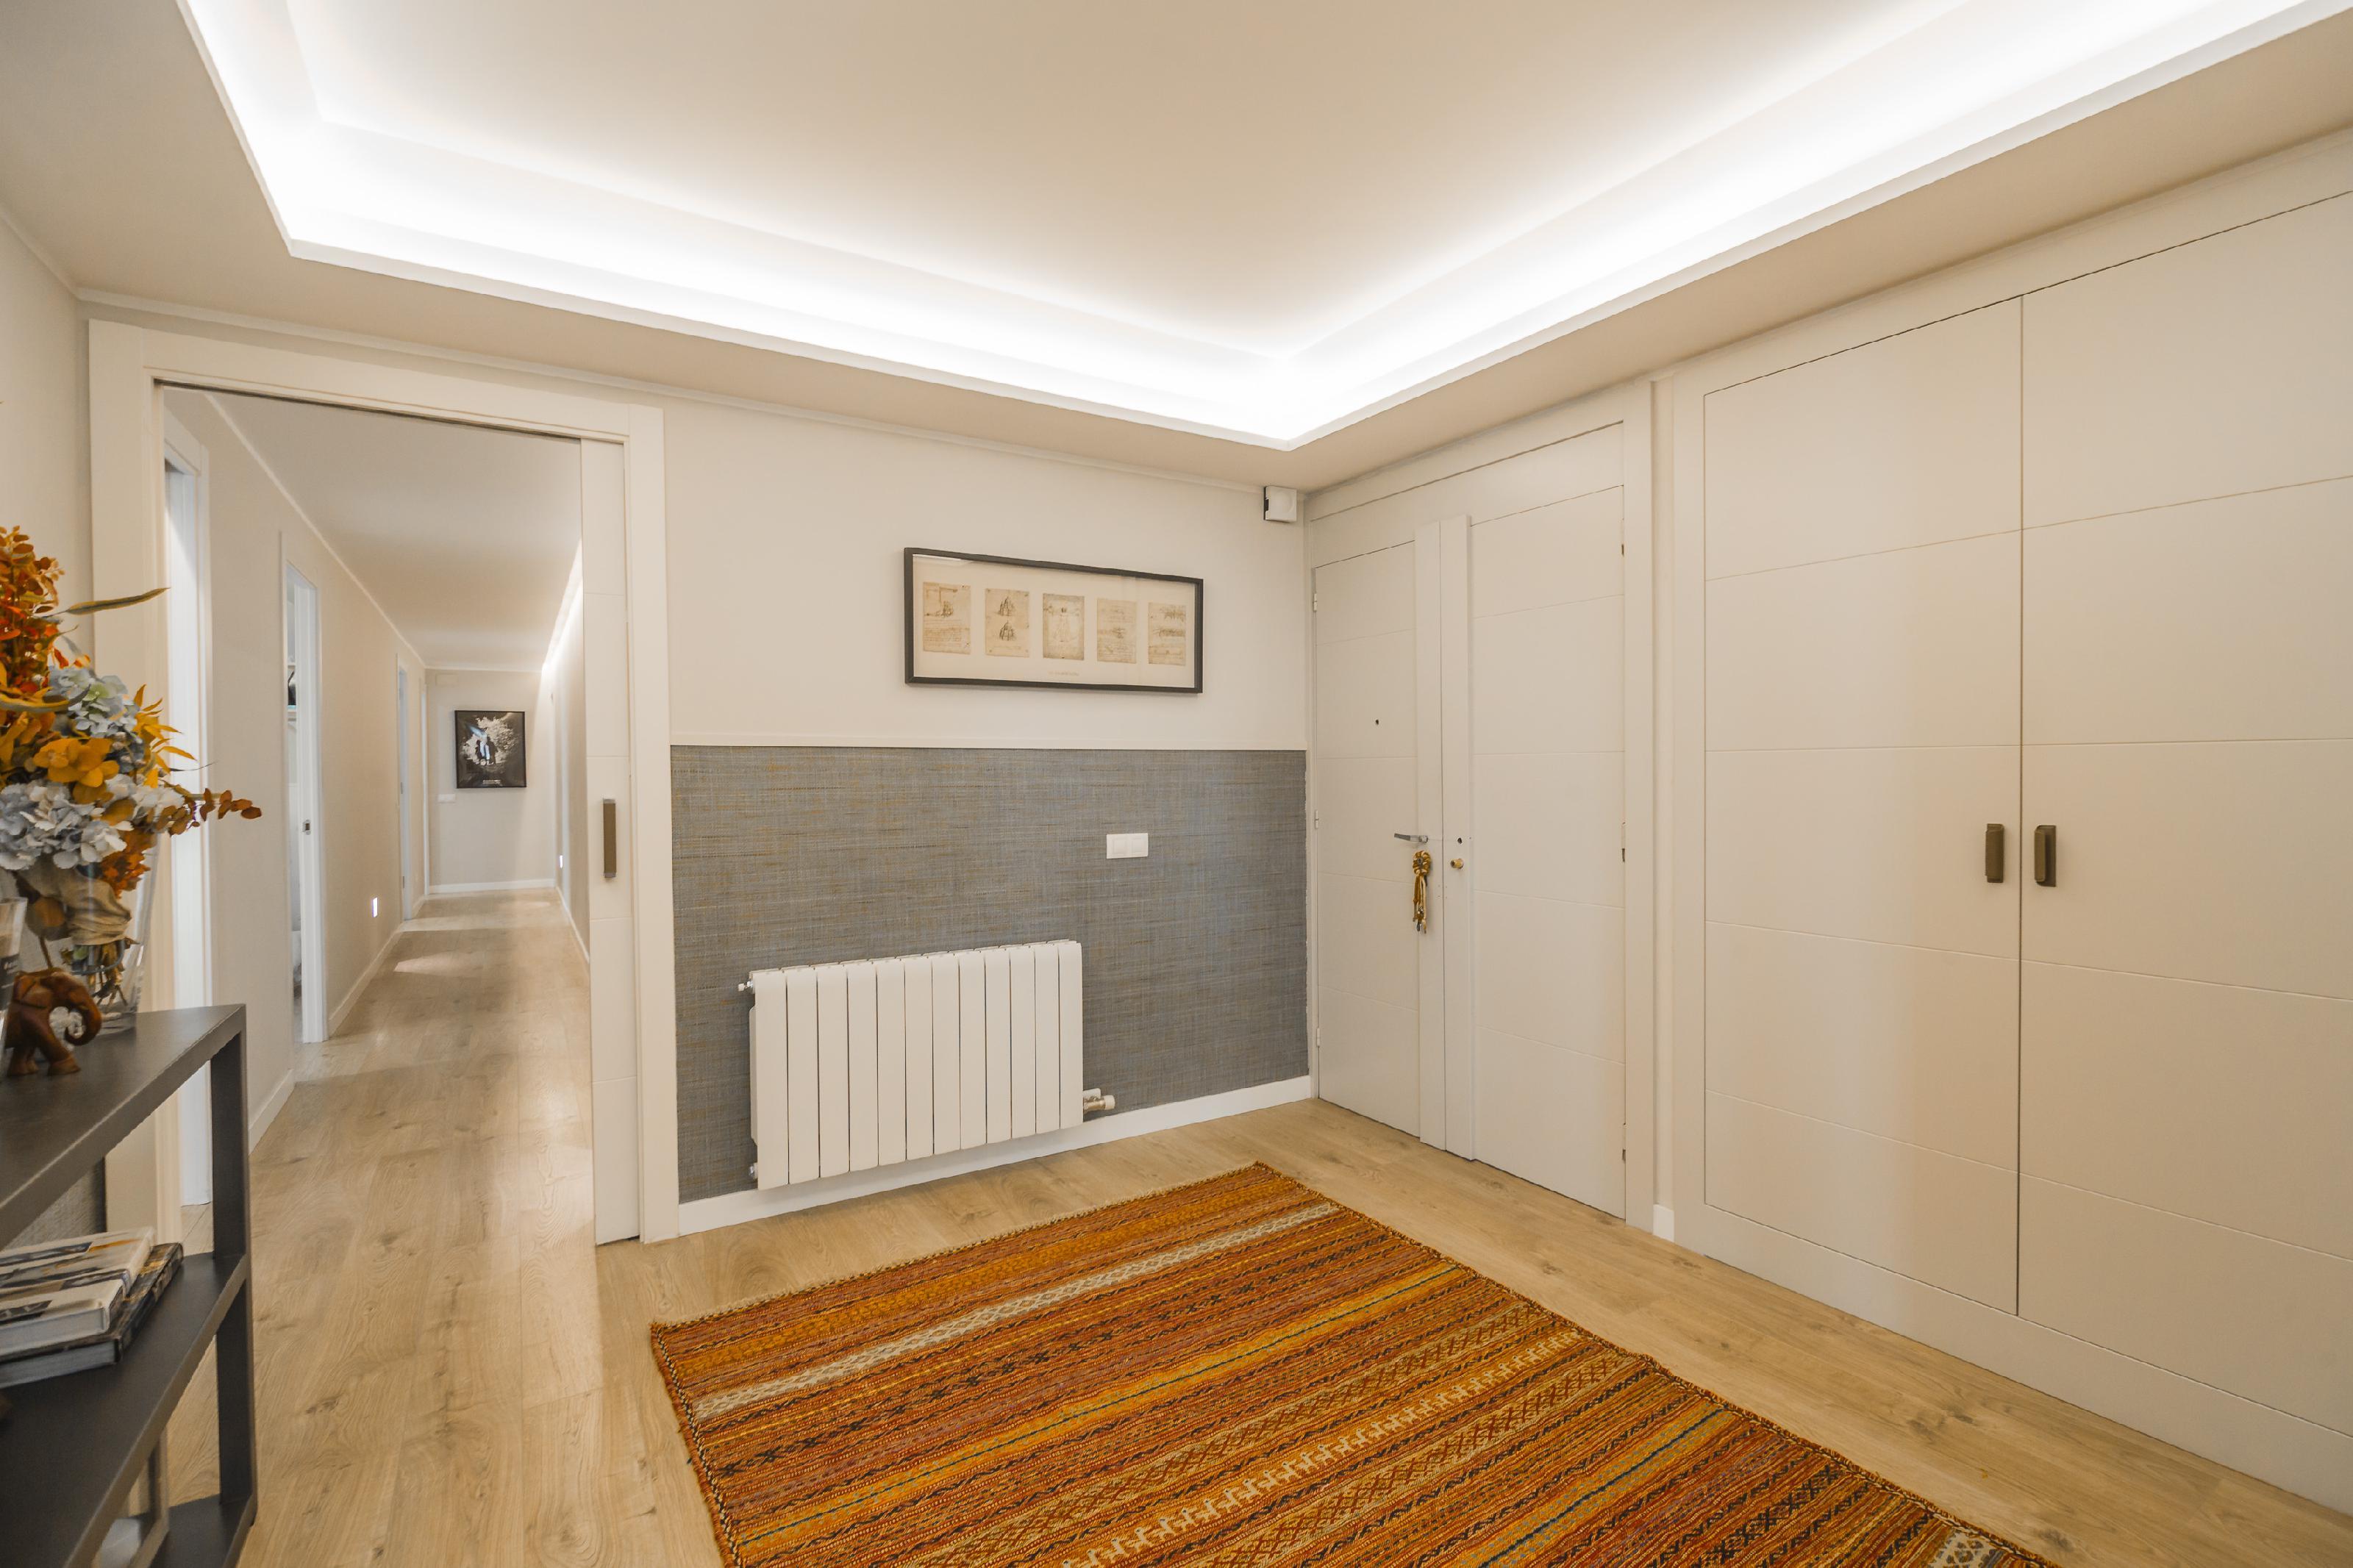 244392 Flat for sale in Sarrià-Sant Gervasi, Sant Gervasi-Galvany 18